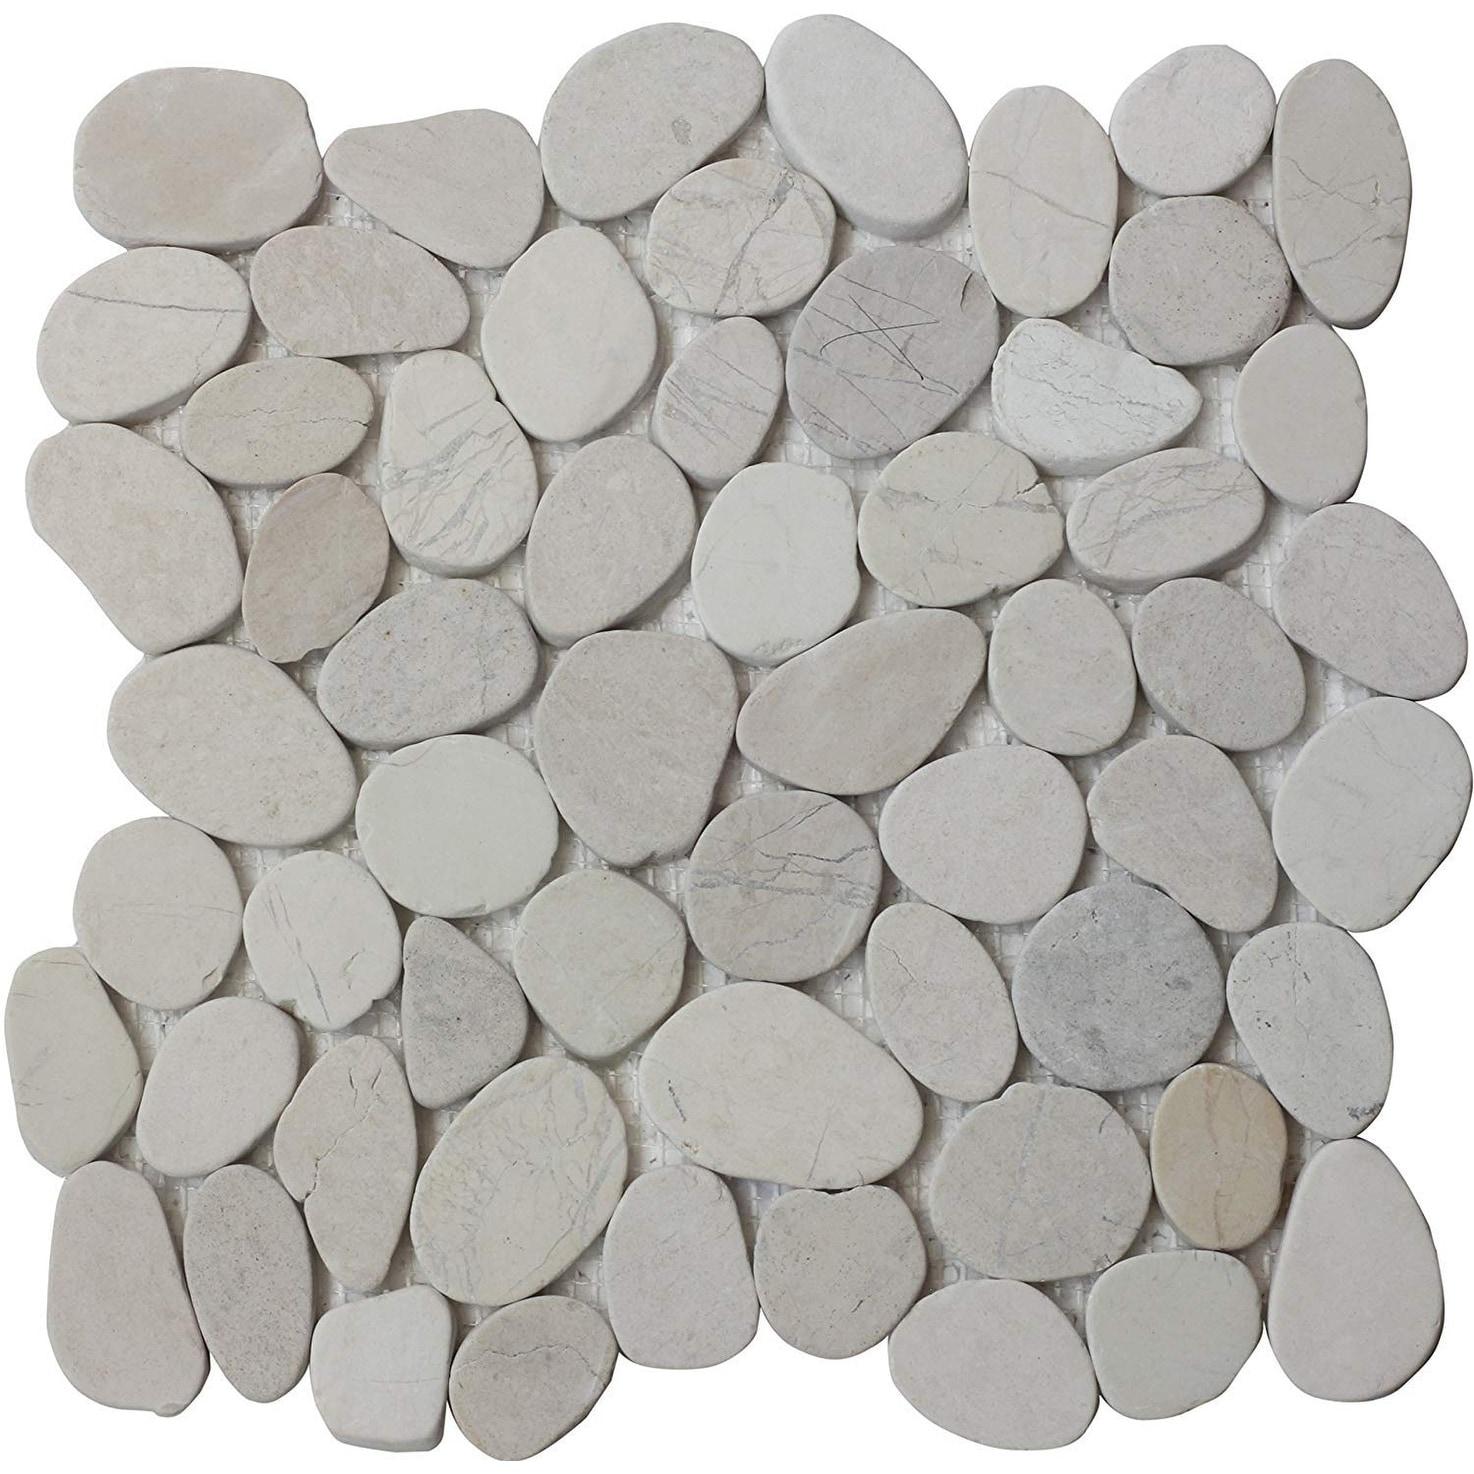 Island White Flat Pebble Mesh Tiles